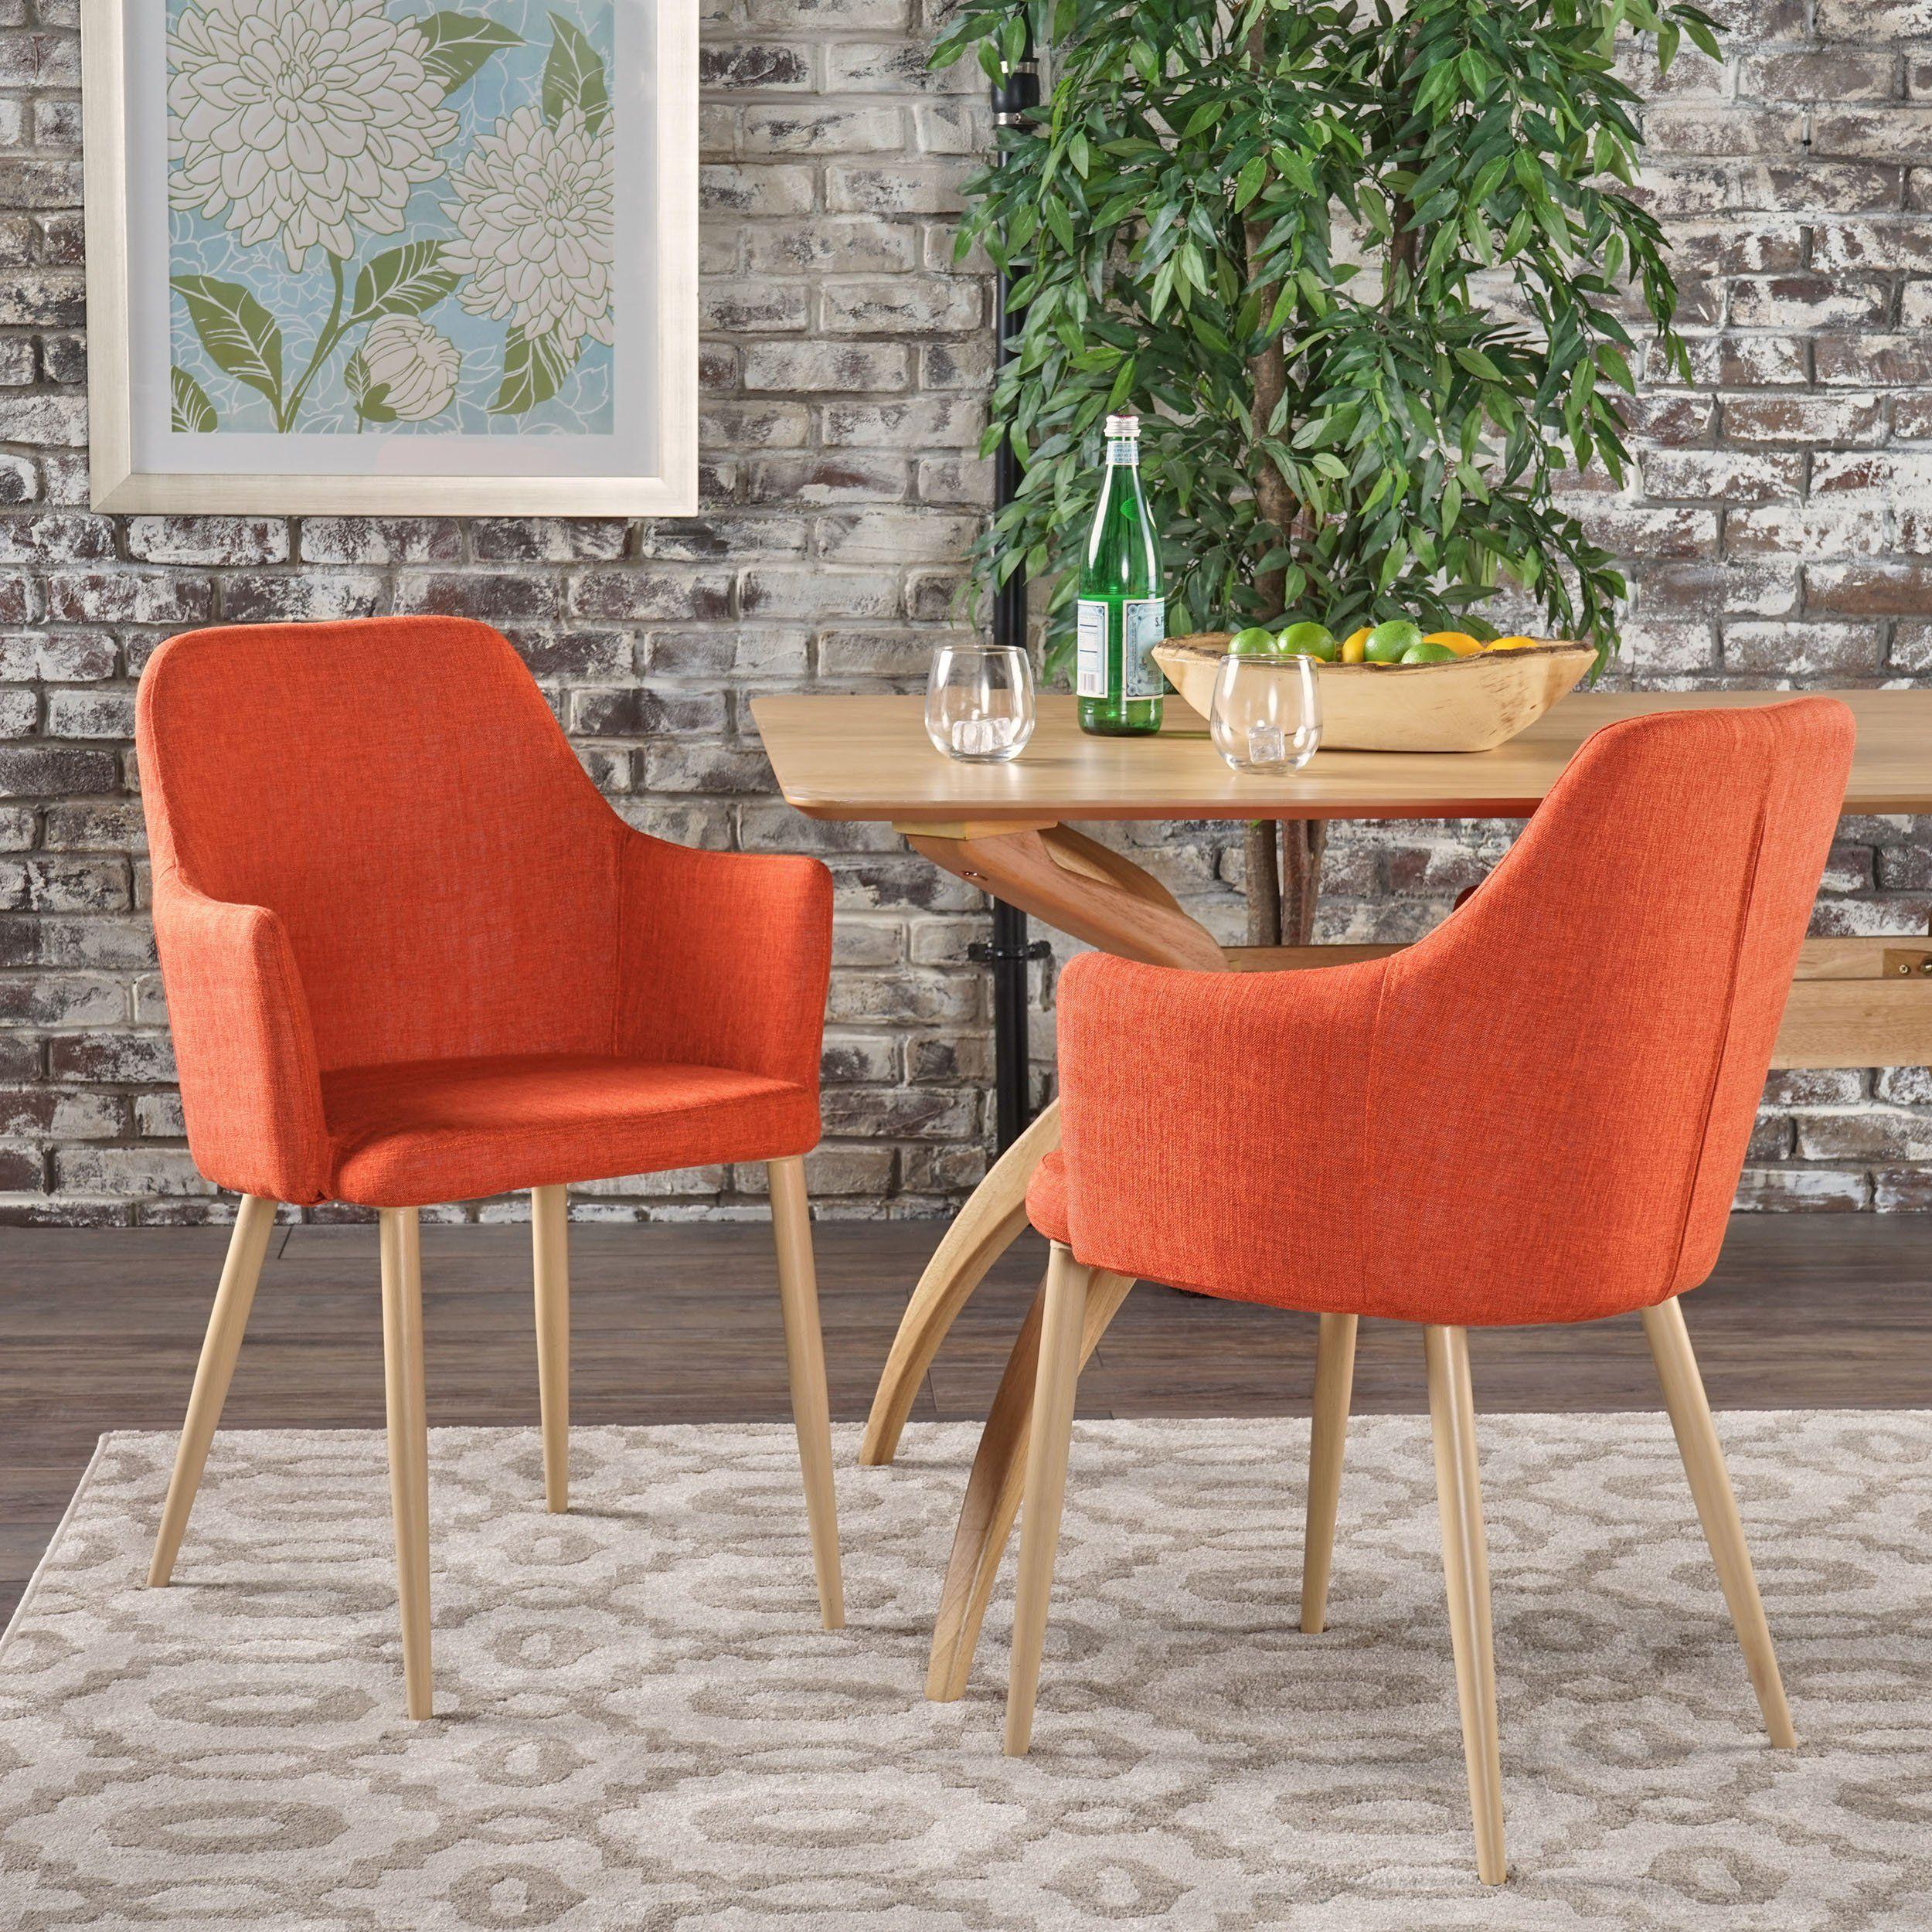 Serra Mid Century Modern Muted Orange Fabric Dining Chair With Lig Fabric Dining Chairs Mid Century Modern Fabric Dining Chairs Midcentury Modern Dining Chairs